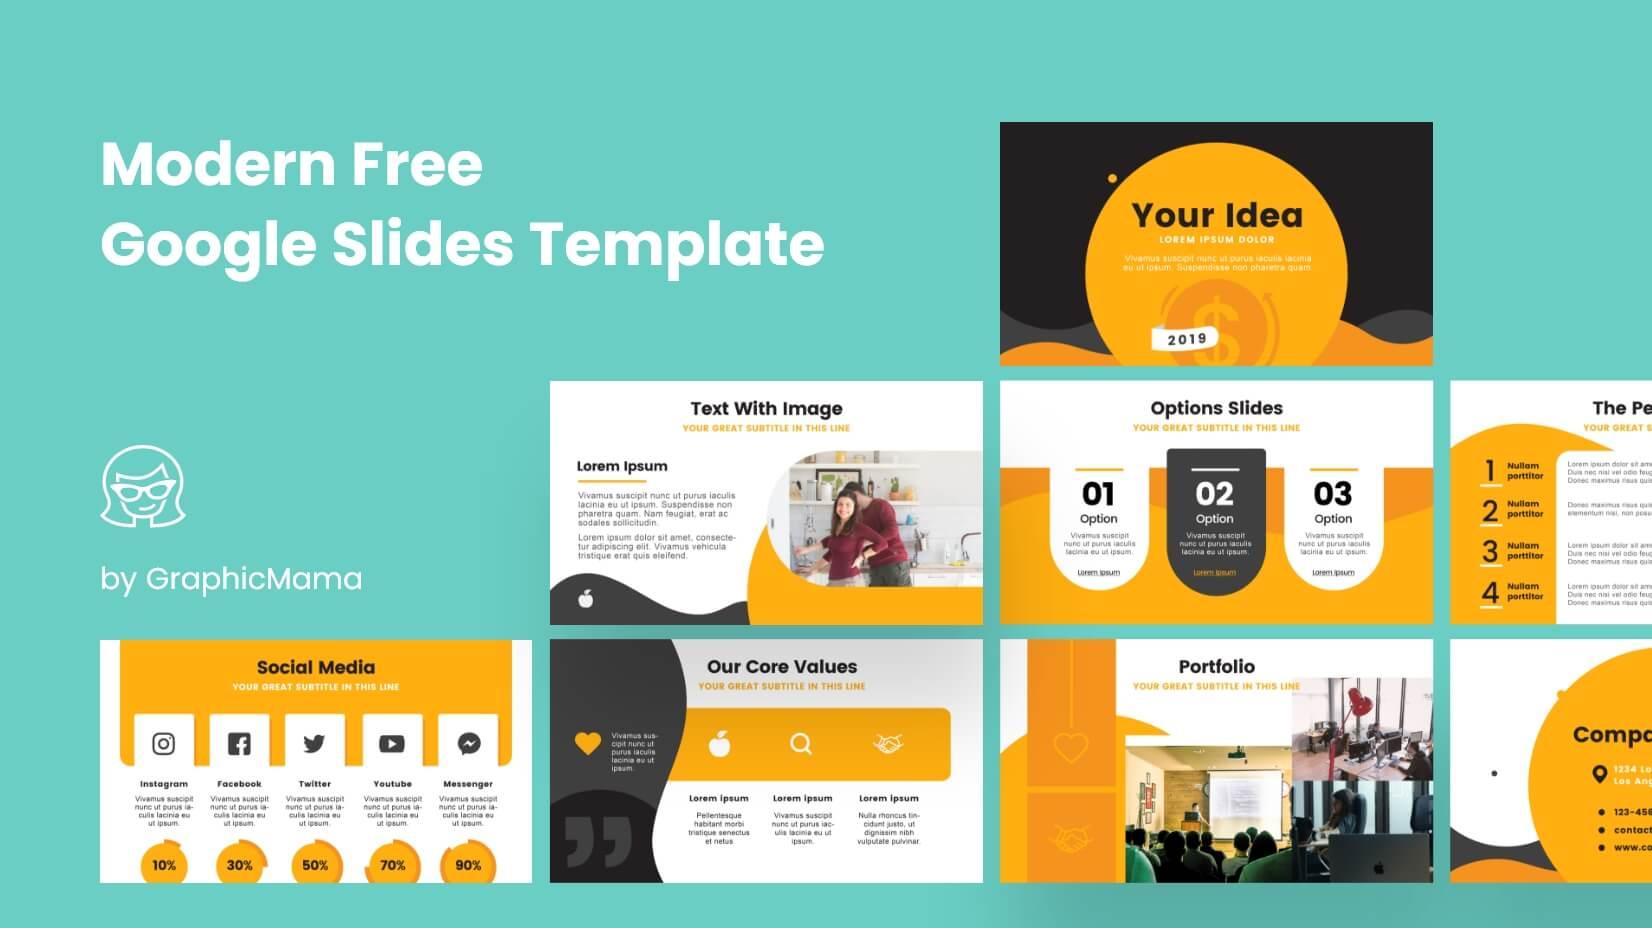 Modern-Free-Google-Slides-Template.